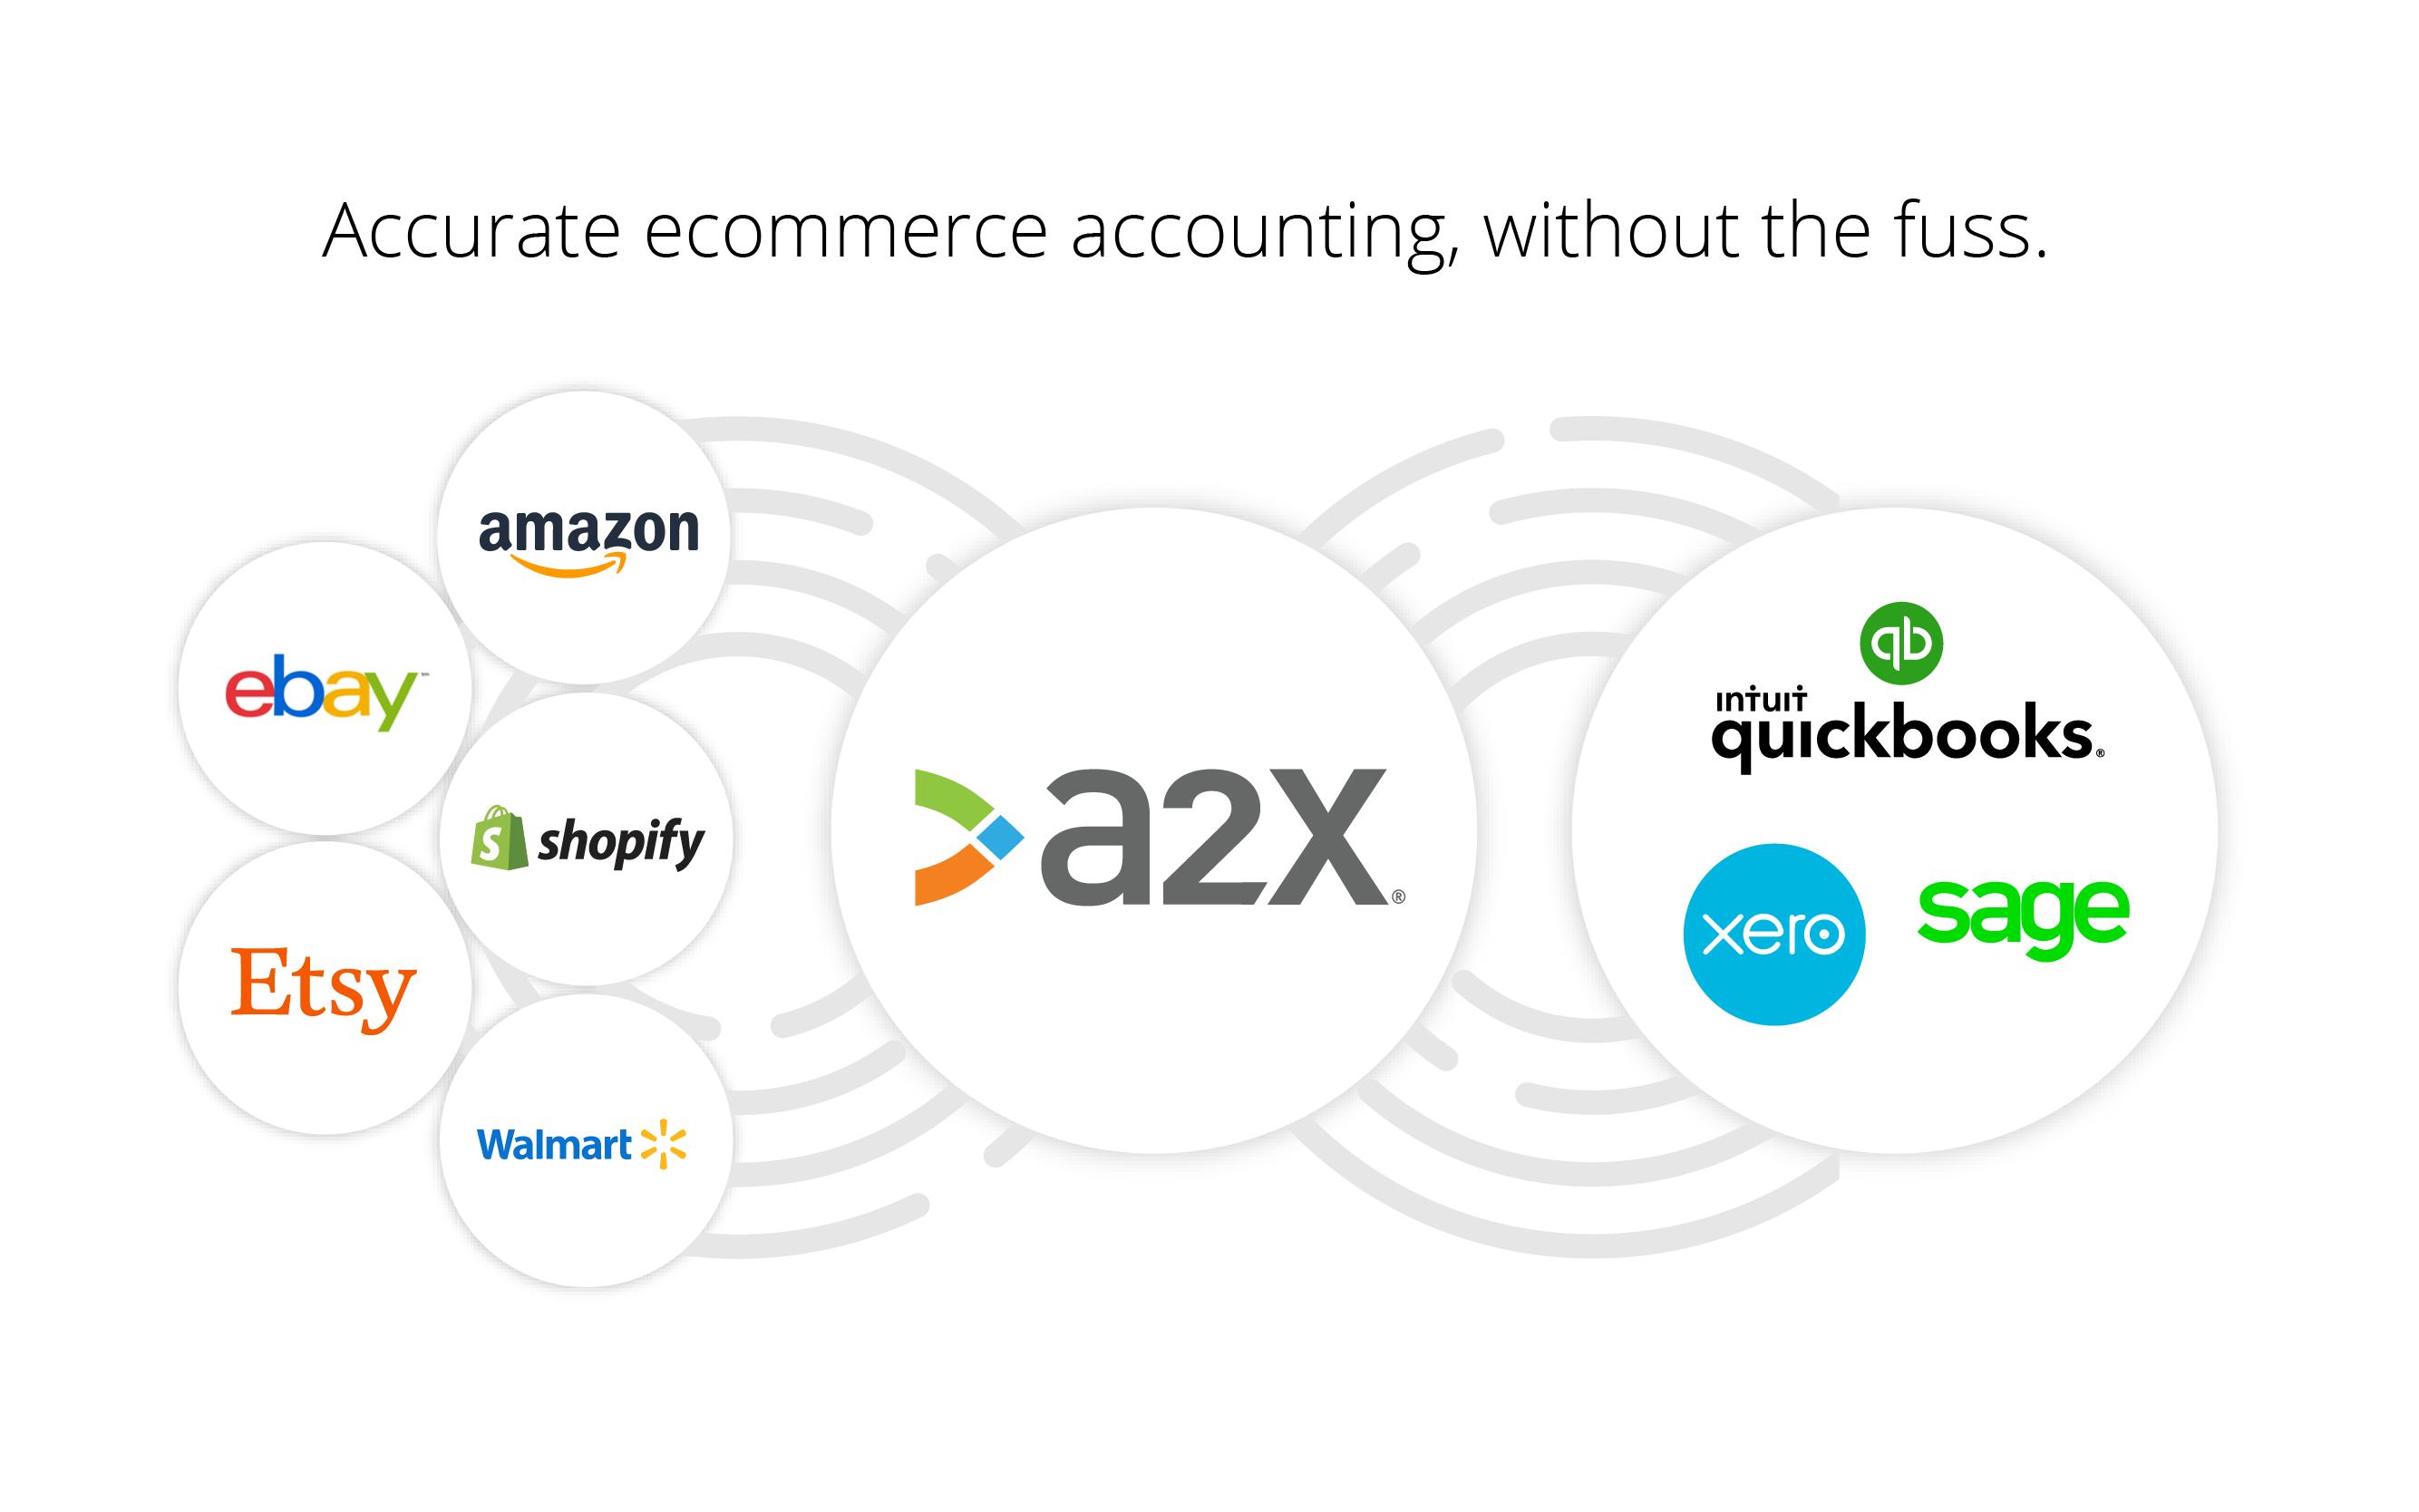 Syncs Amazon, Shopify, eBay, Etsy and Walmart into QuickBooks, Xero and Sage.